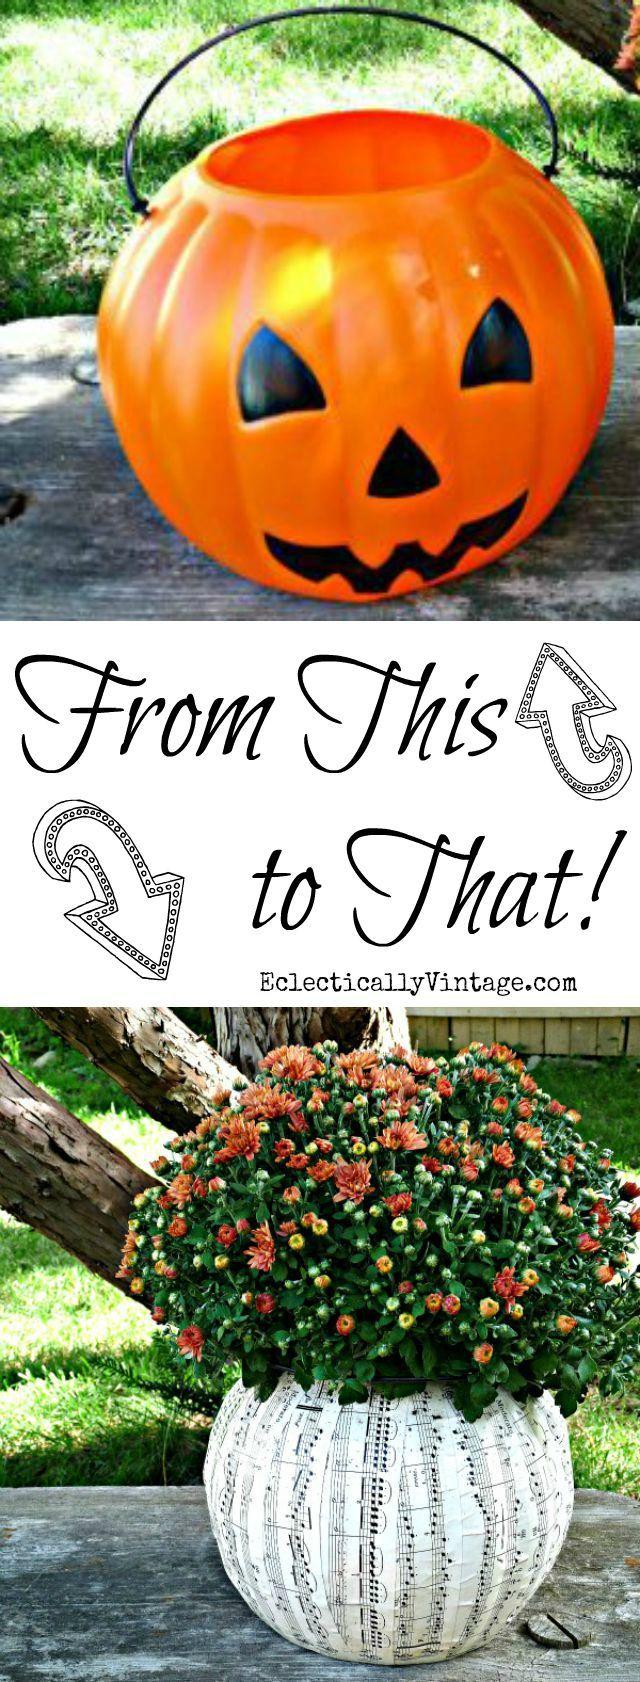 Plastic Pumpkin Ideas - turn an ugly plastic pumpkin pail into a fun planter - step by step directions plus more creative pumpkin ideas! eclecticallyvintage.com